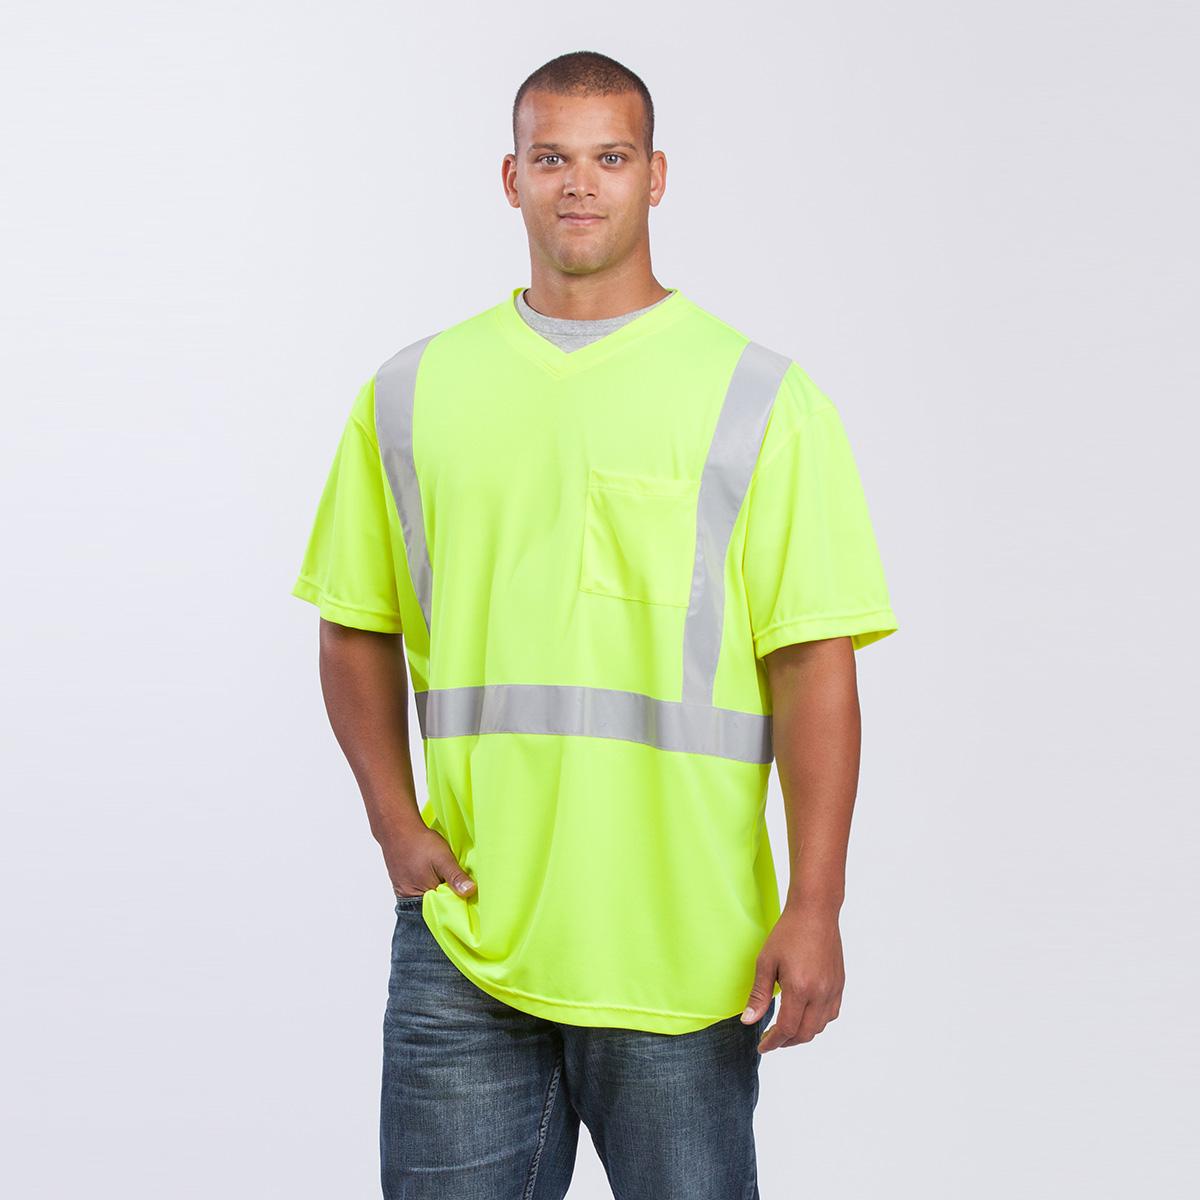 class-II-shirt-short-sleeve-Performance-Fabric-yellow-front